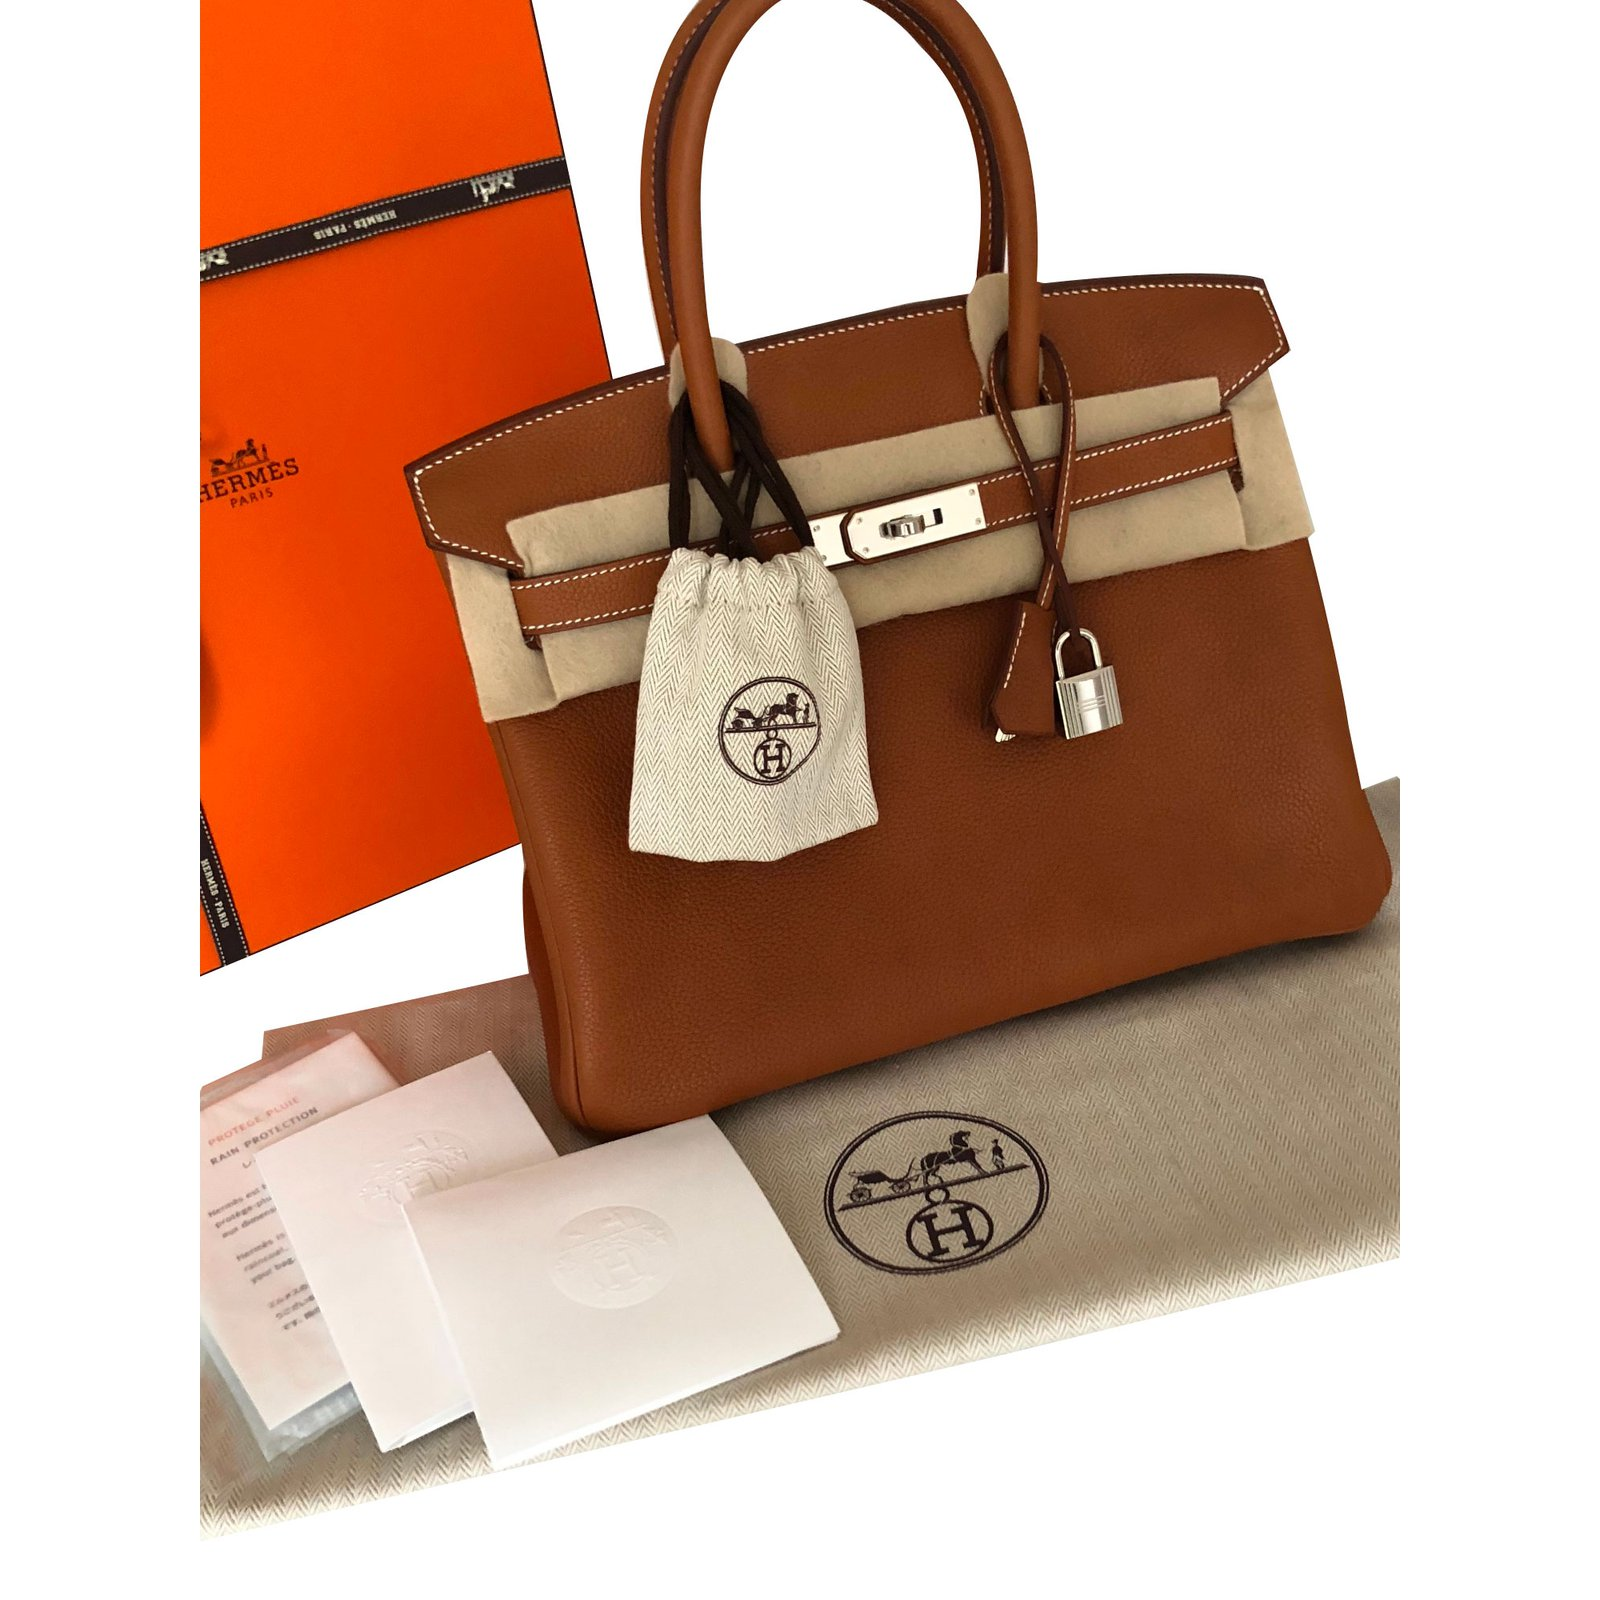 best price hermes birkin bag 35 togo gold 3cd99 3dabf  sale hermès birkin  30 barenia faubourg handbags leather brown ref.73741 0c865 fa26f bed8f6a4f0716